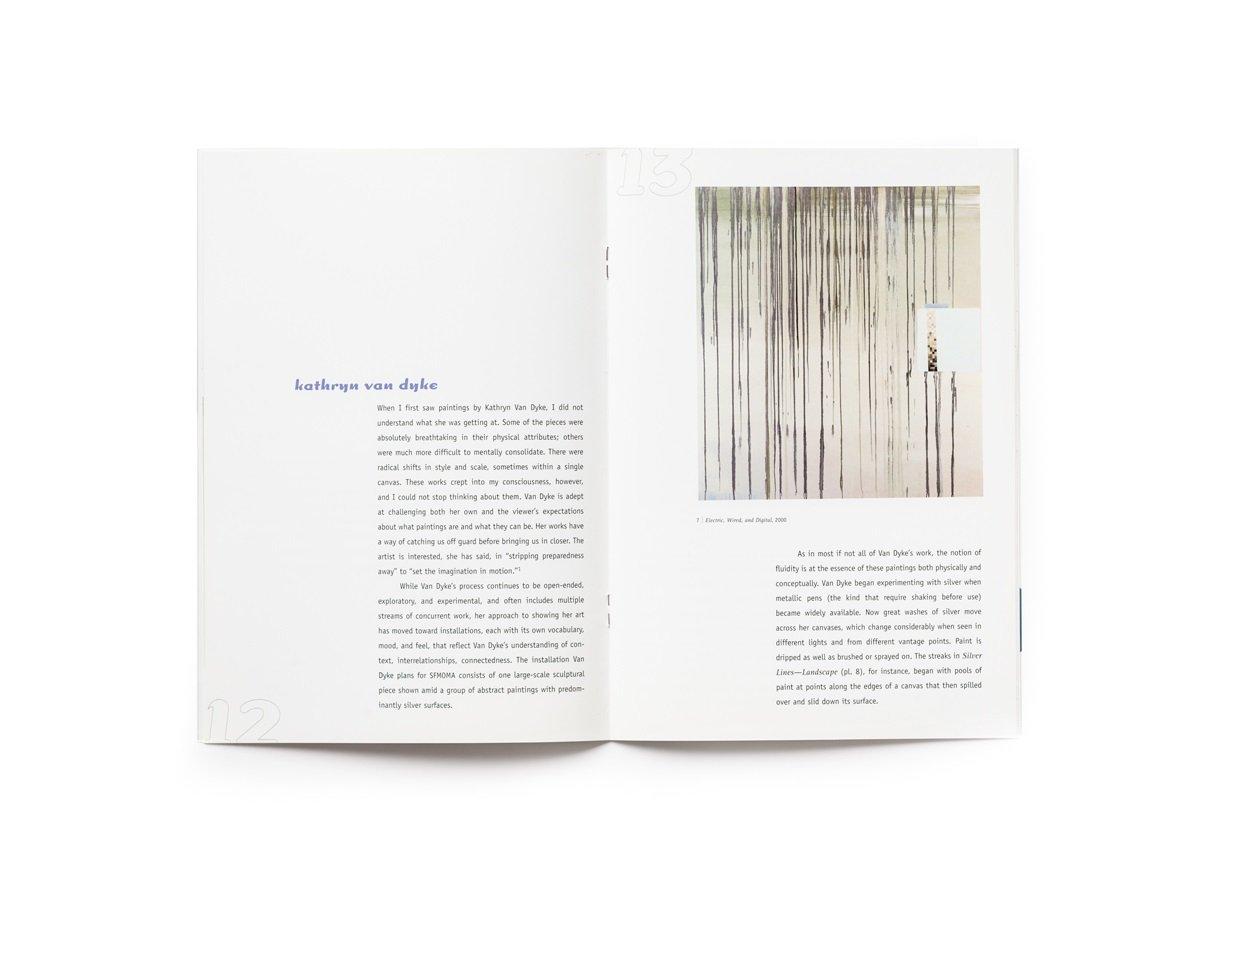 2000 SECA Art Award publication pages 12-13